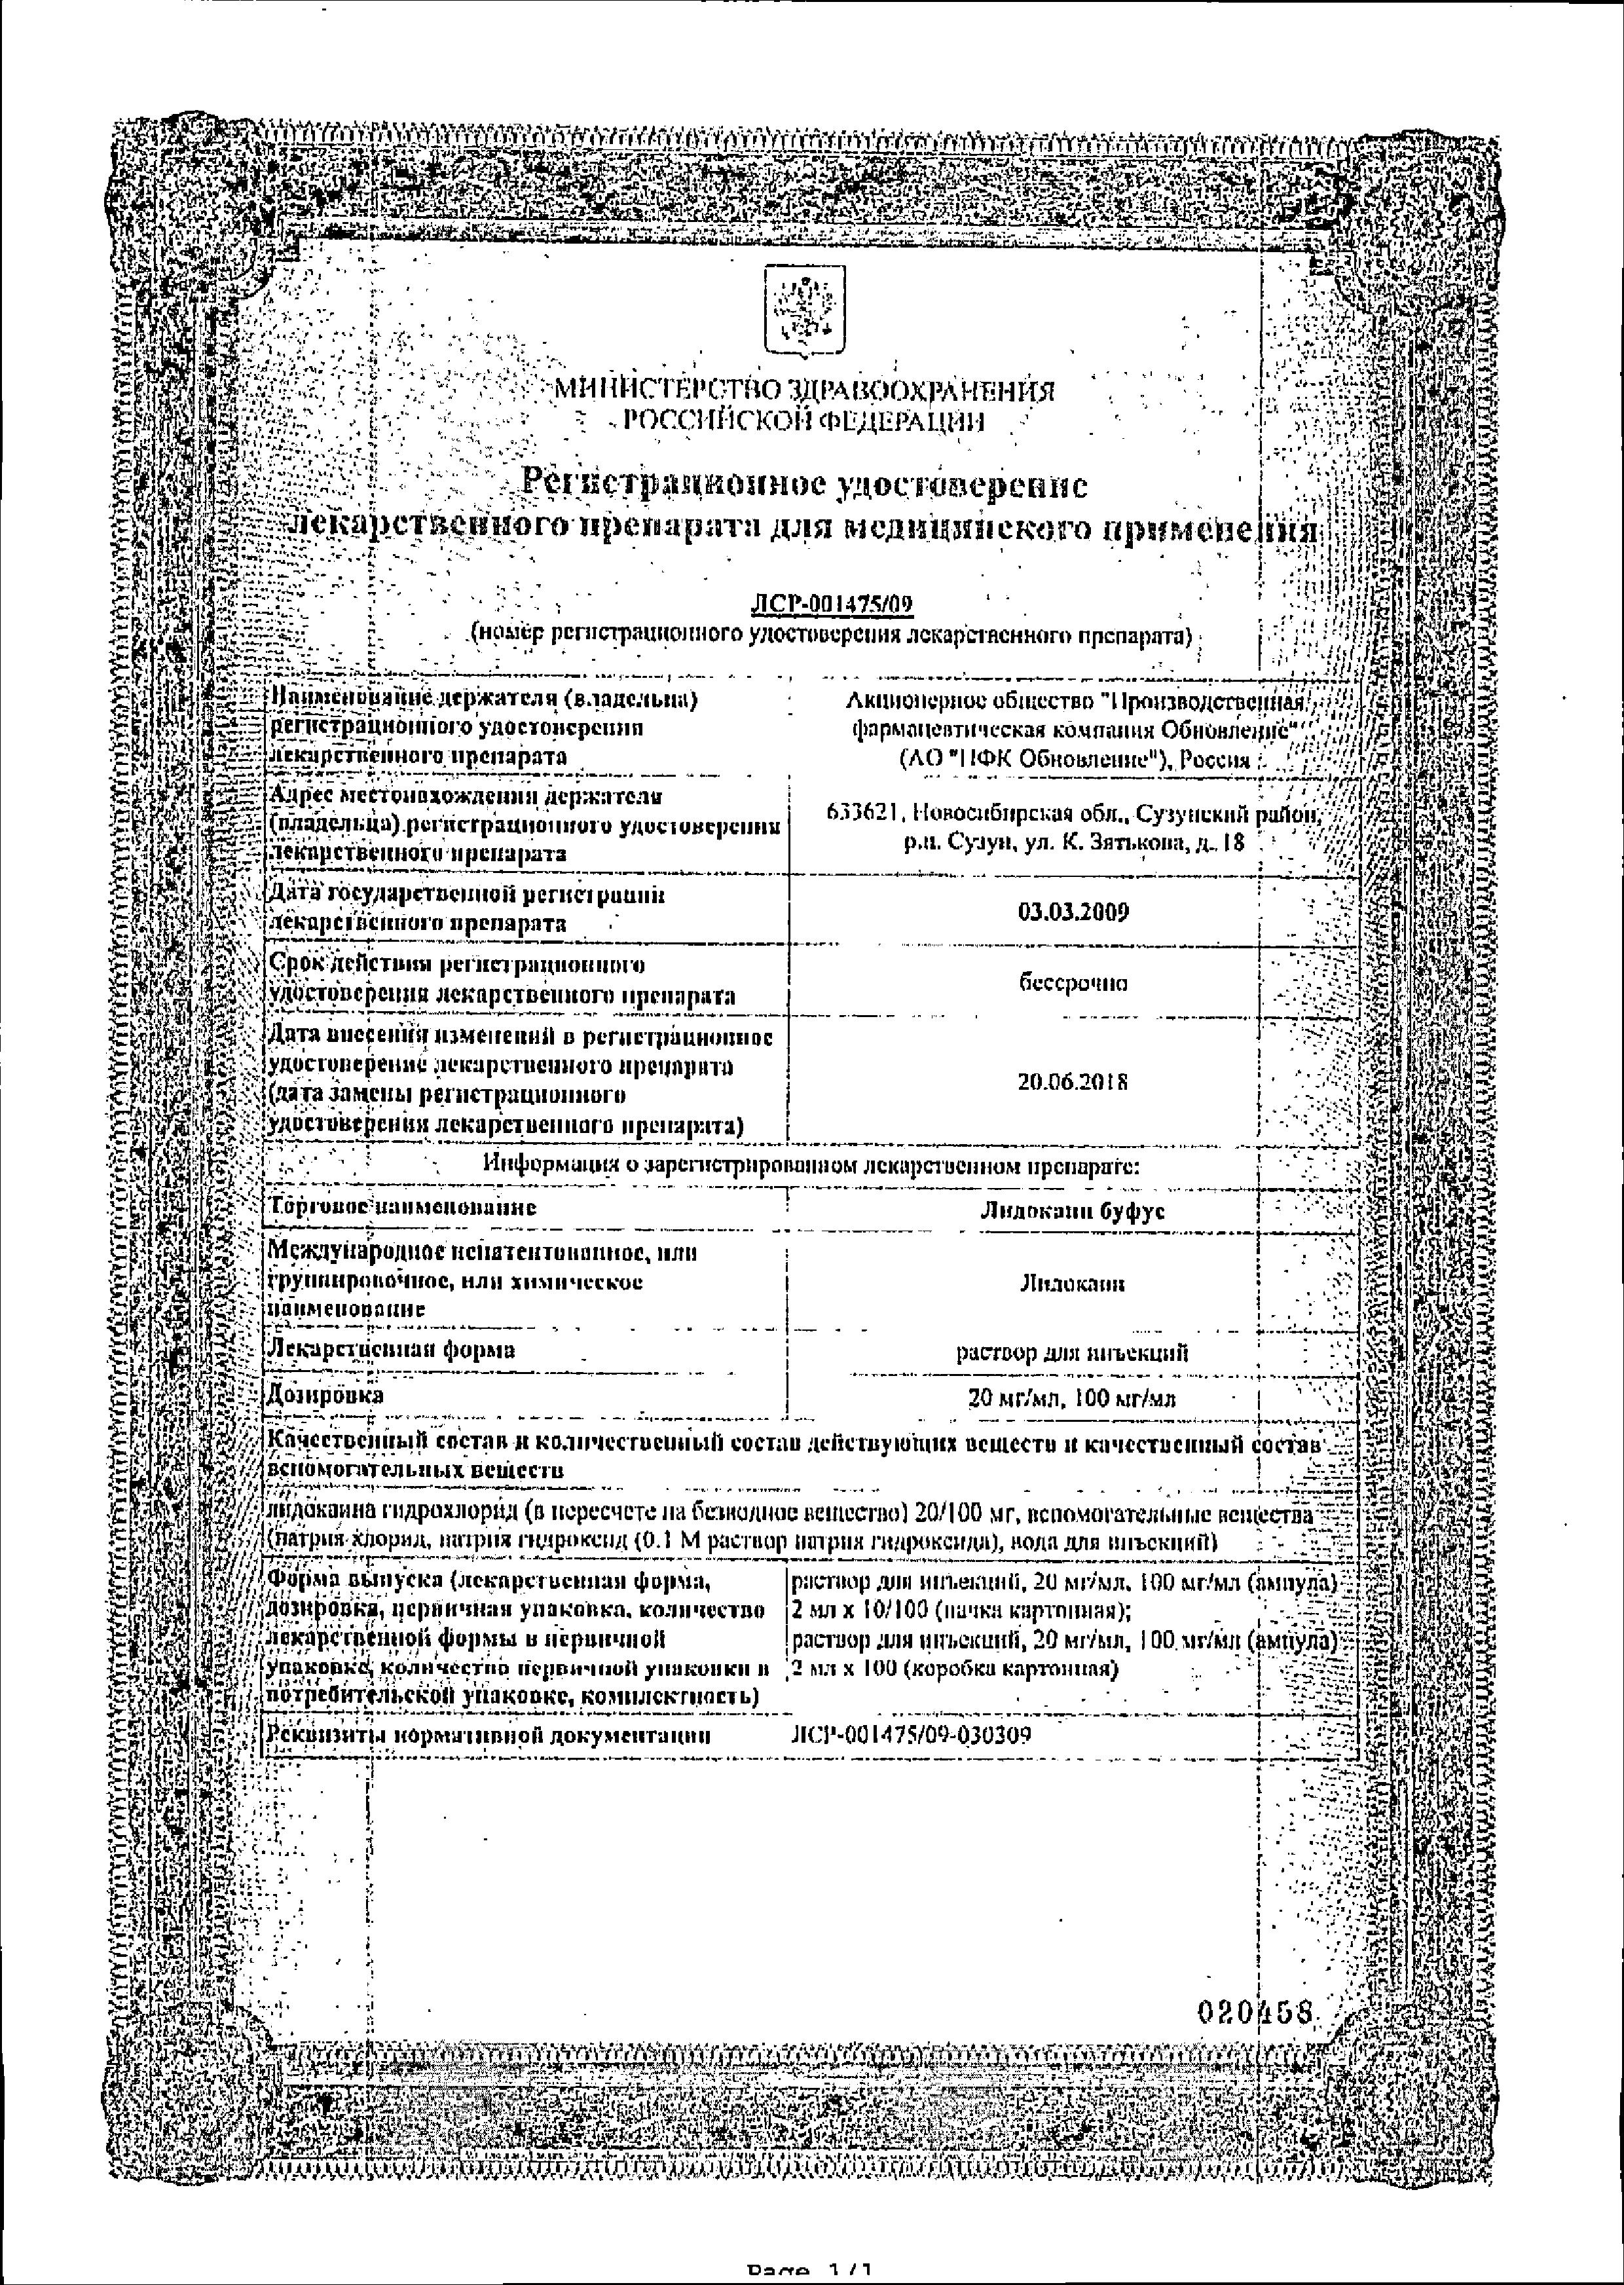 Лидокаин буфус сертификат